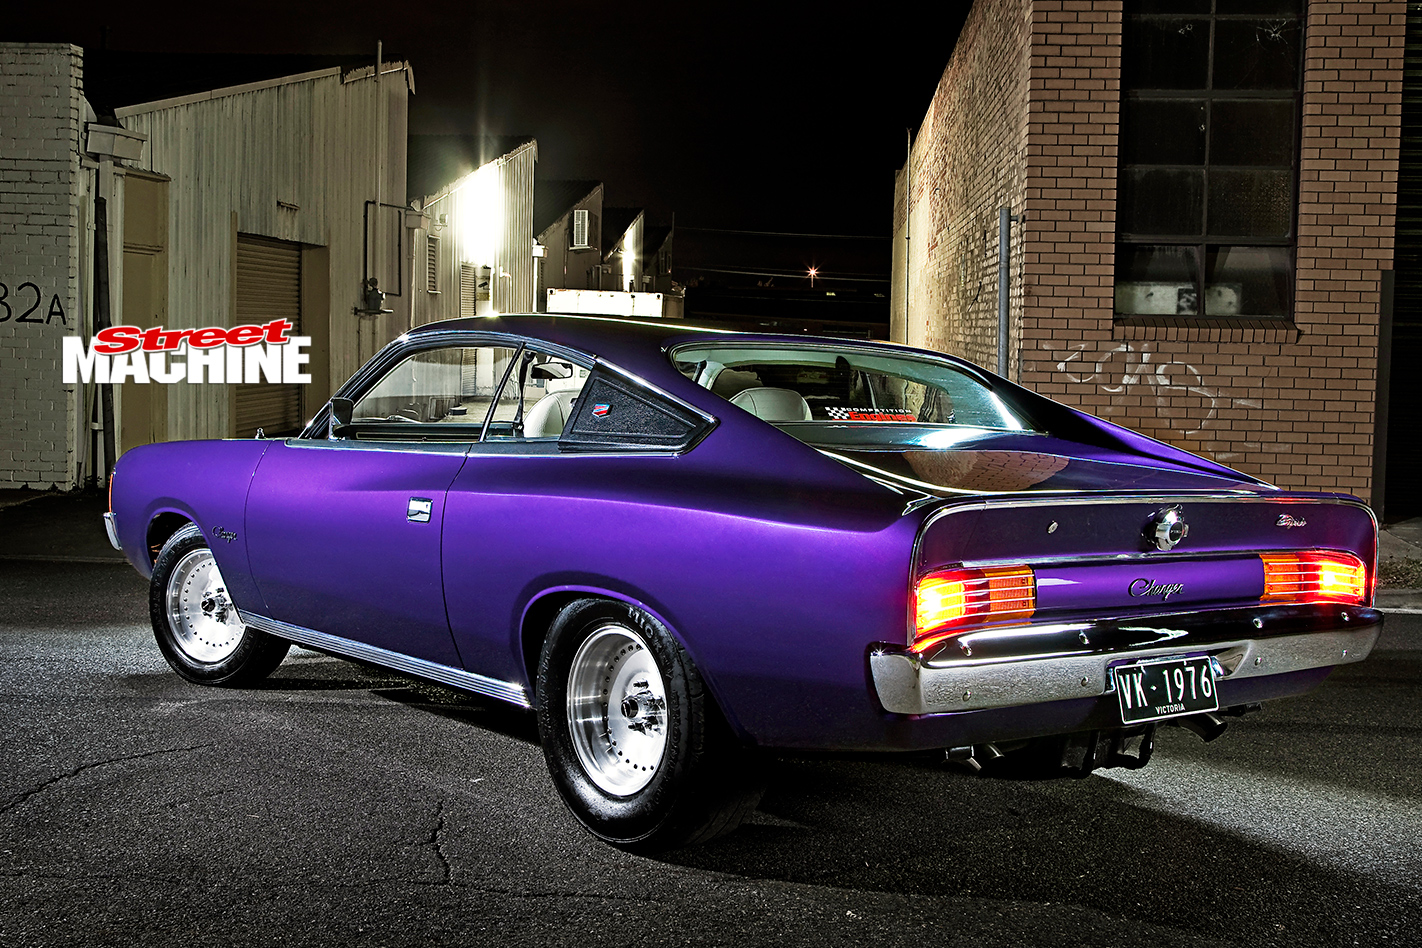 Chrysler -vk -valiant -charger -rear -angle